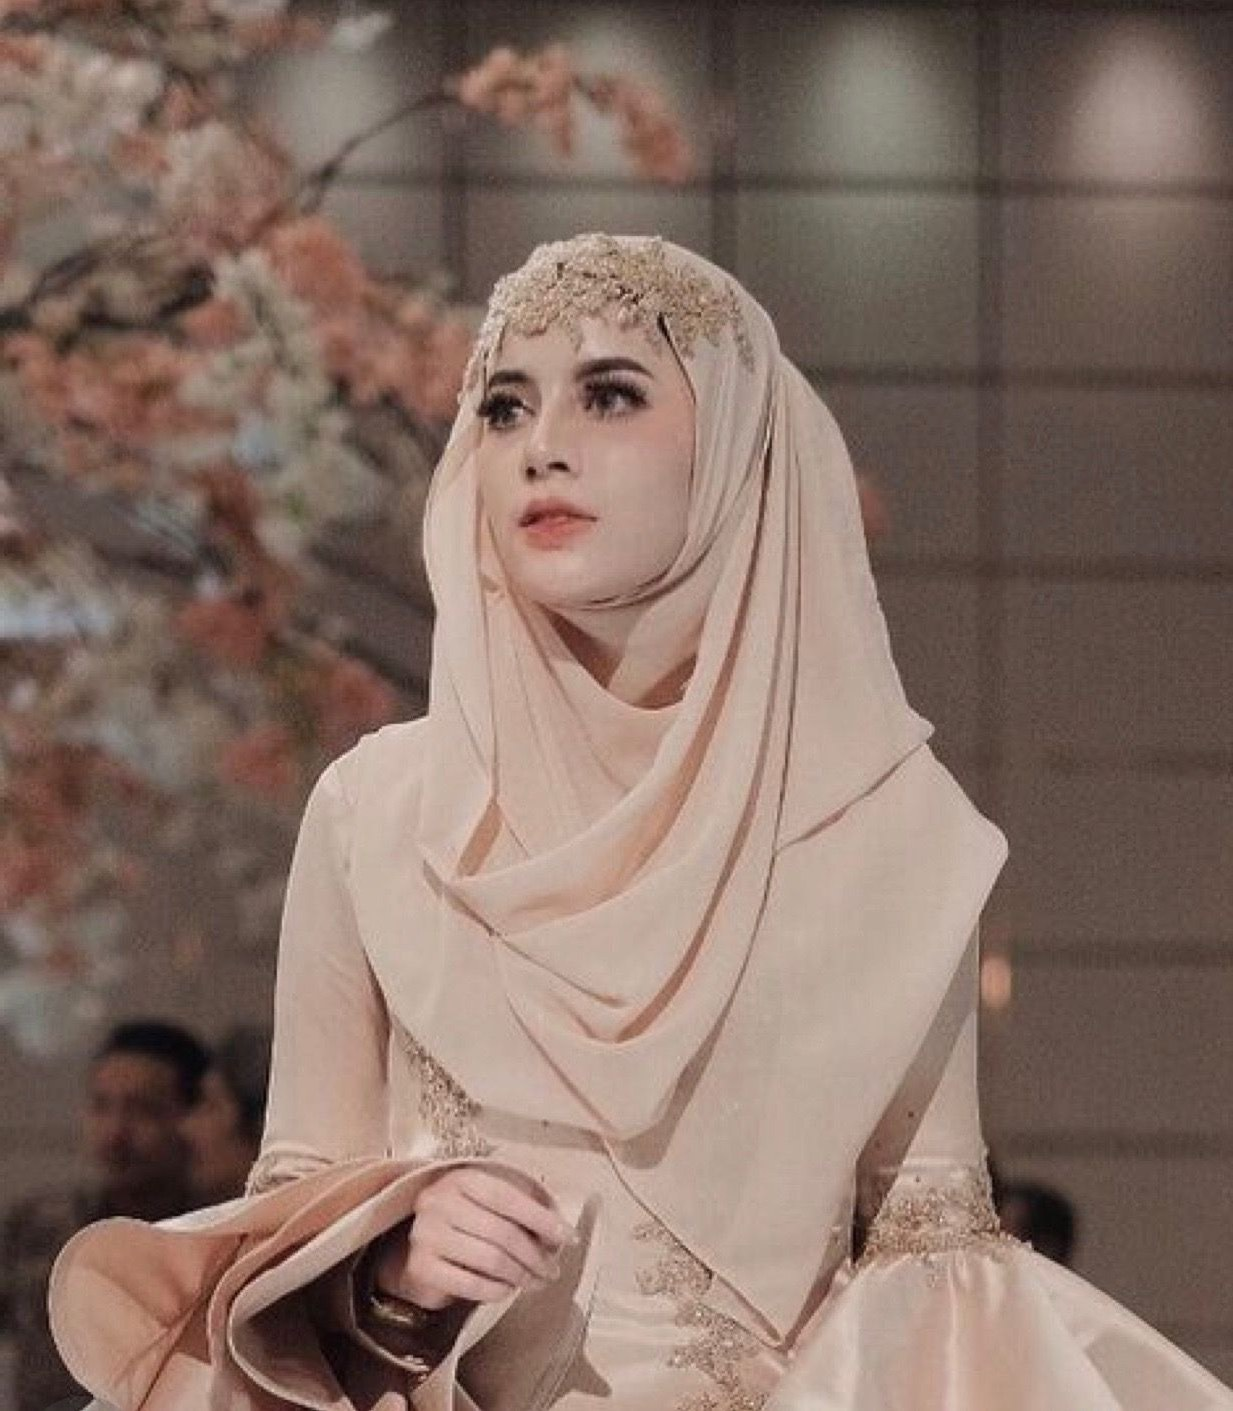 Inspirasi Busana Pengantin Berhijab Y7du Pin Oleh Warda Derosallia Di Hijab Mesir Cleopatra Di 2019